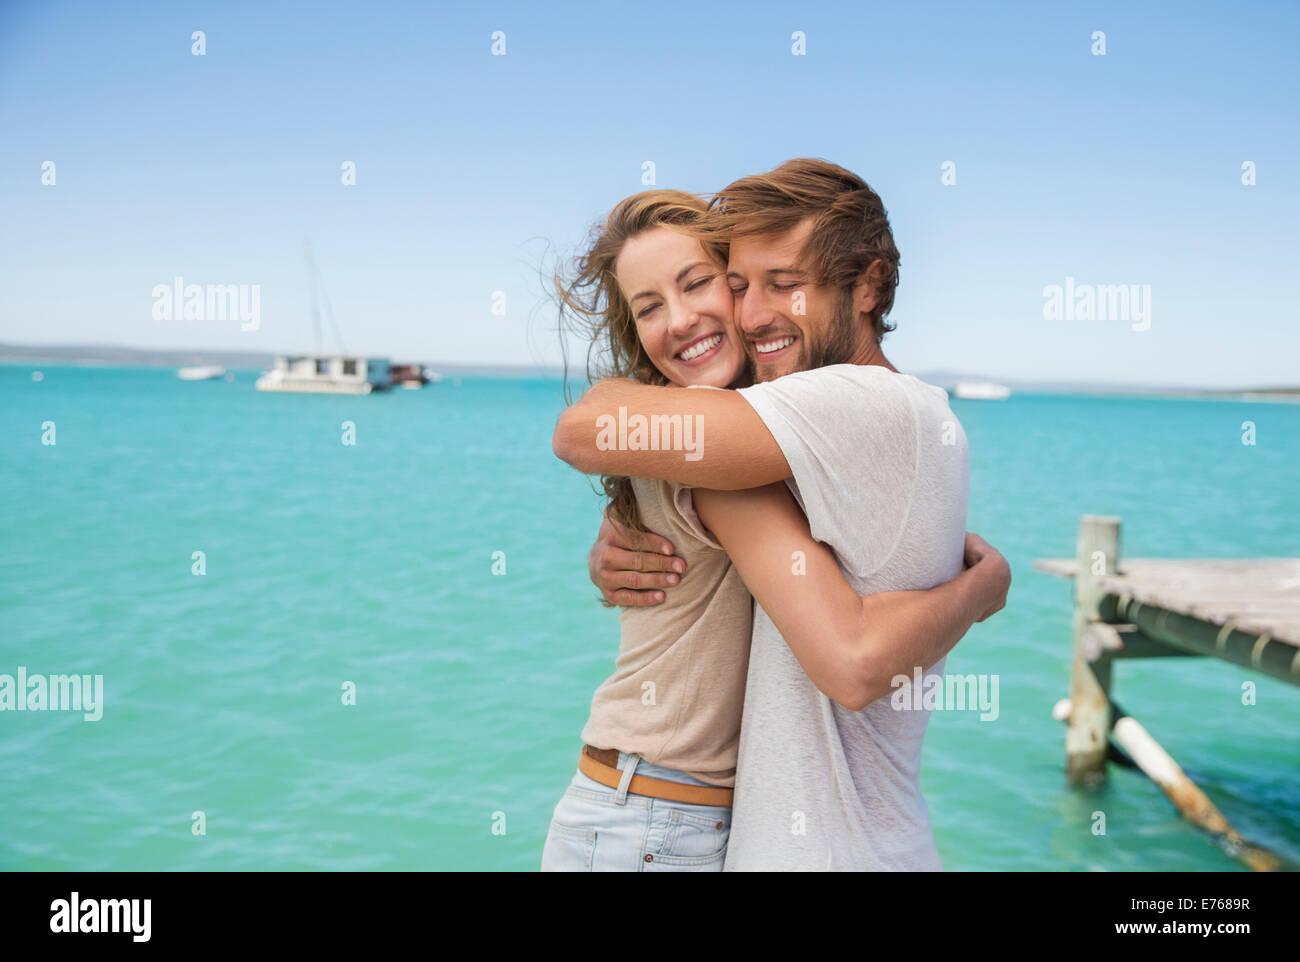 Couple hugging near water - Stock Image